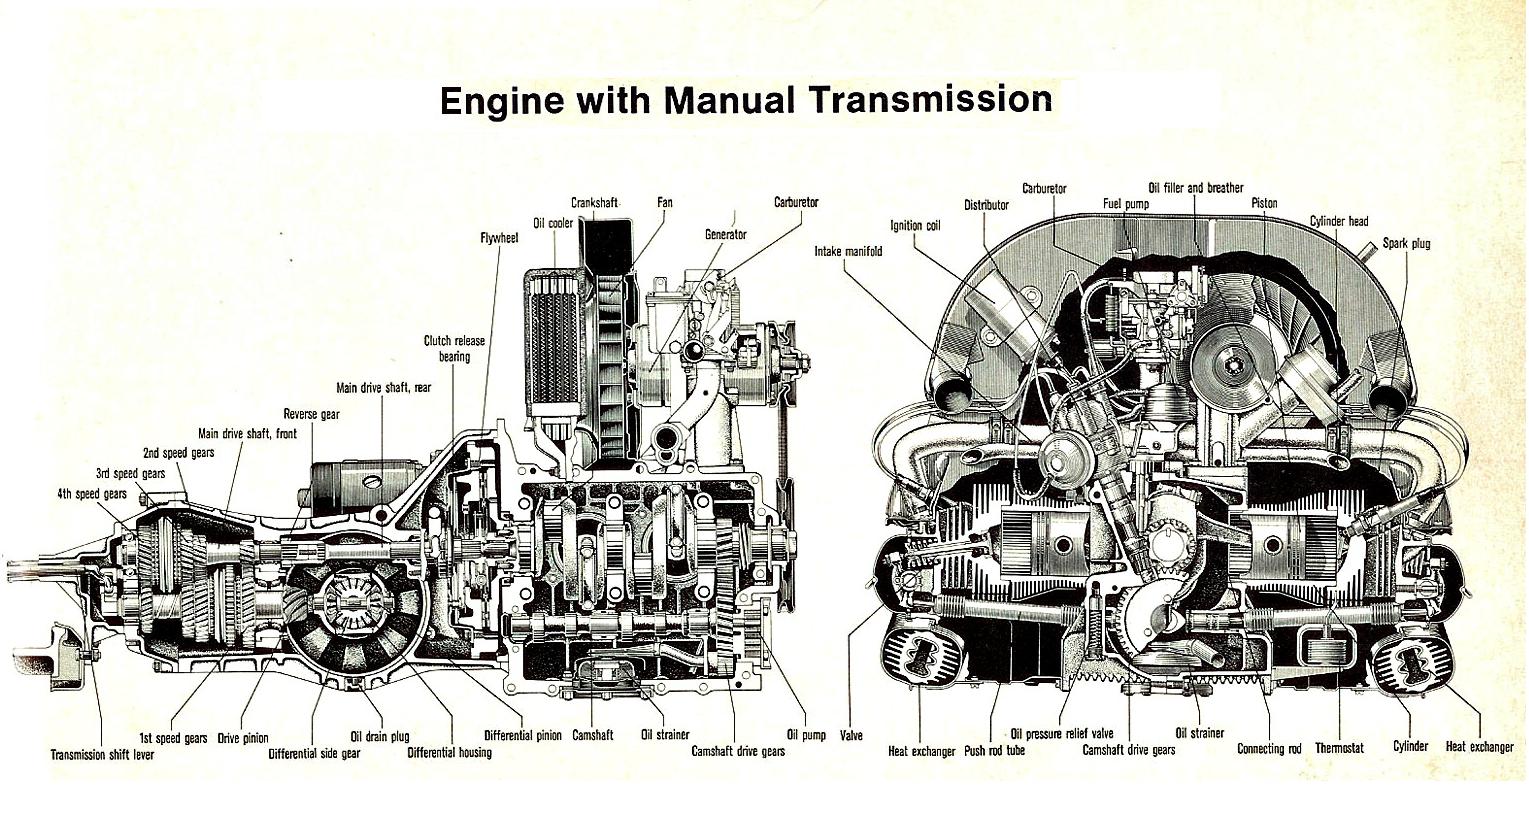 classic vw engine diagram application wiring diagram u2022 rh diagramnet today 1999 VW Beetle Engine Diagram VW New Beetle Engine Diagram